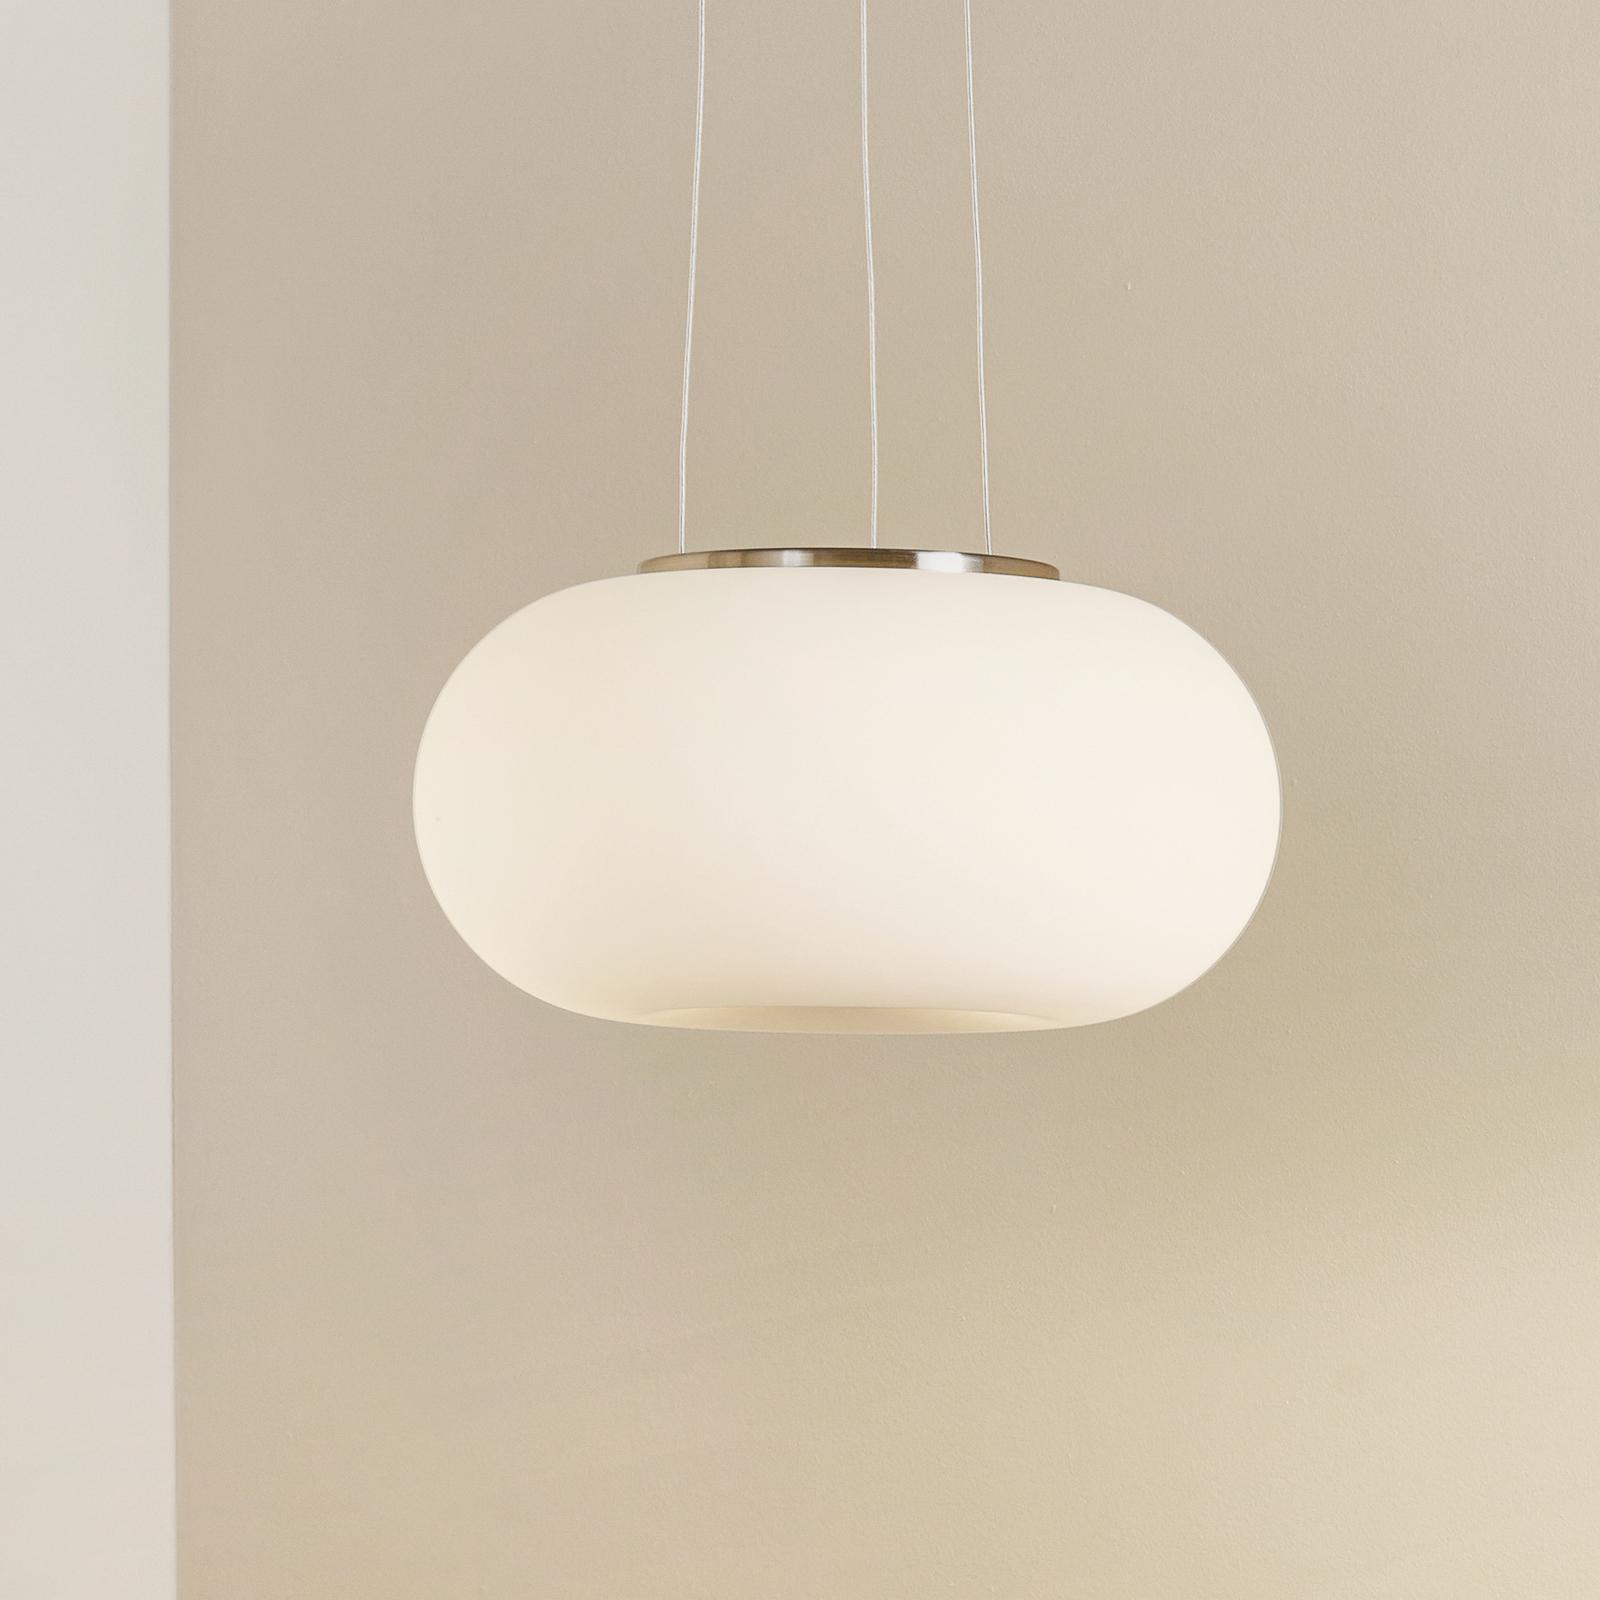 Optica Modern Pendant Lamp_3031243_1